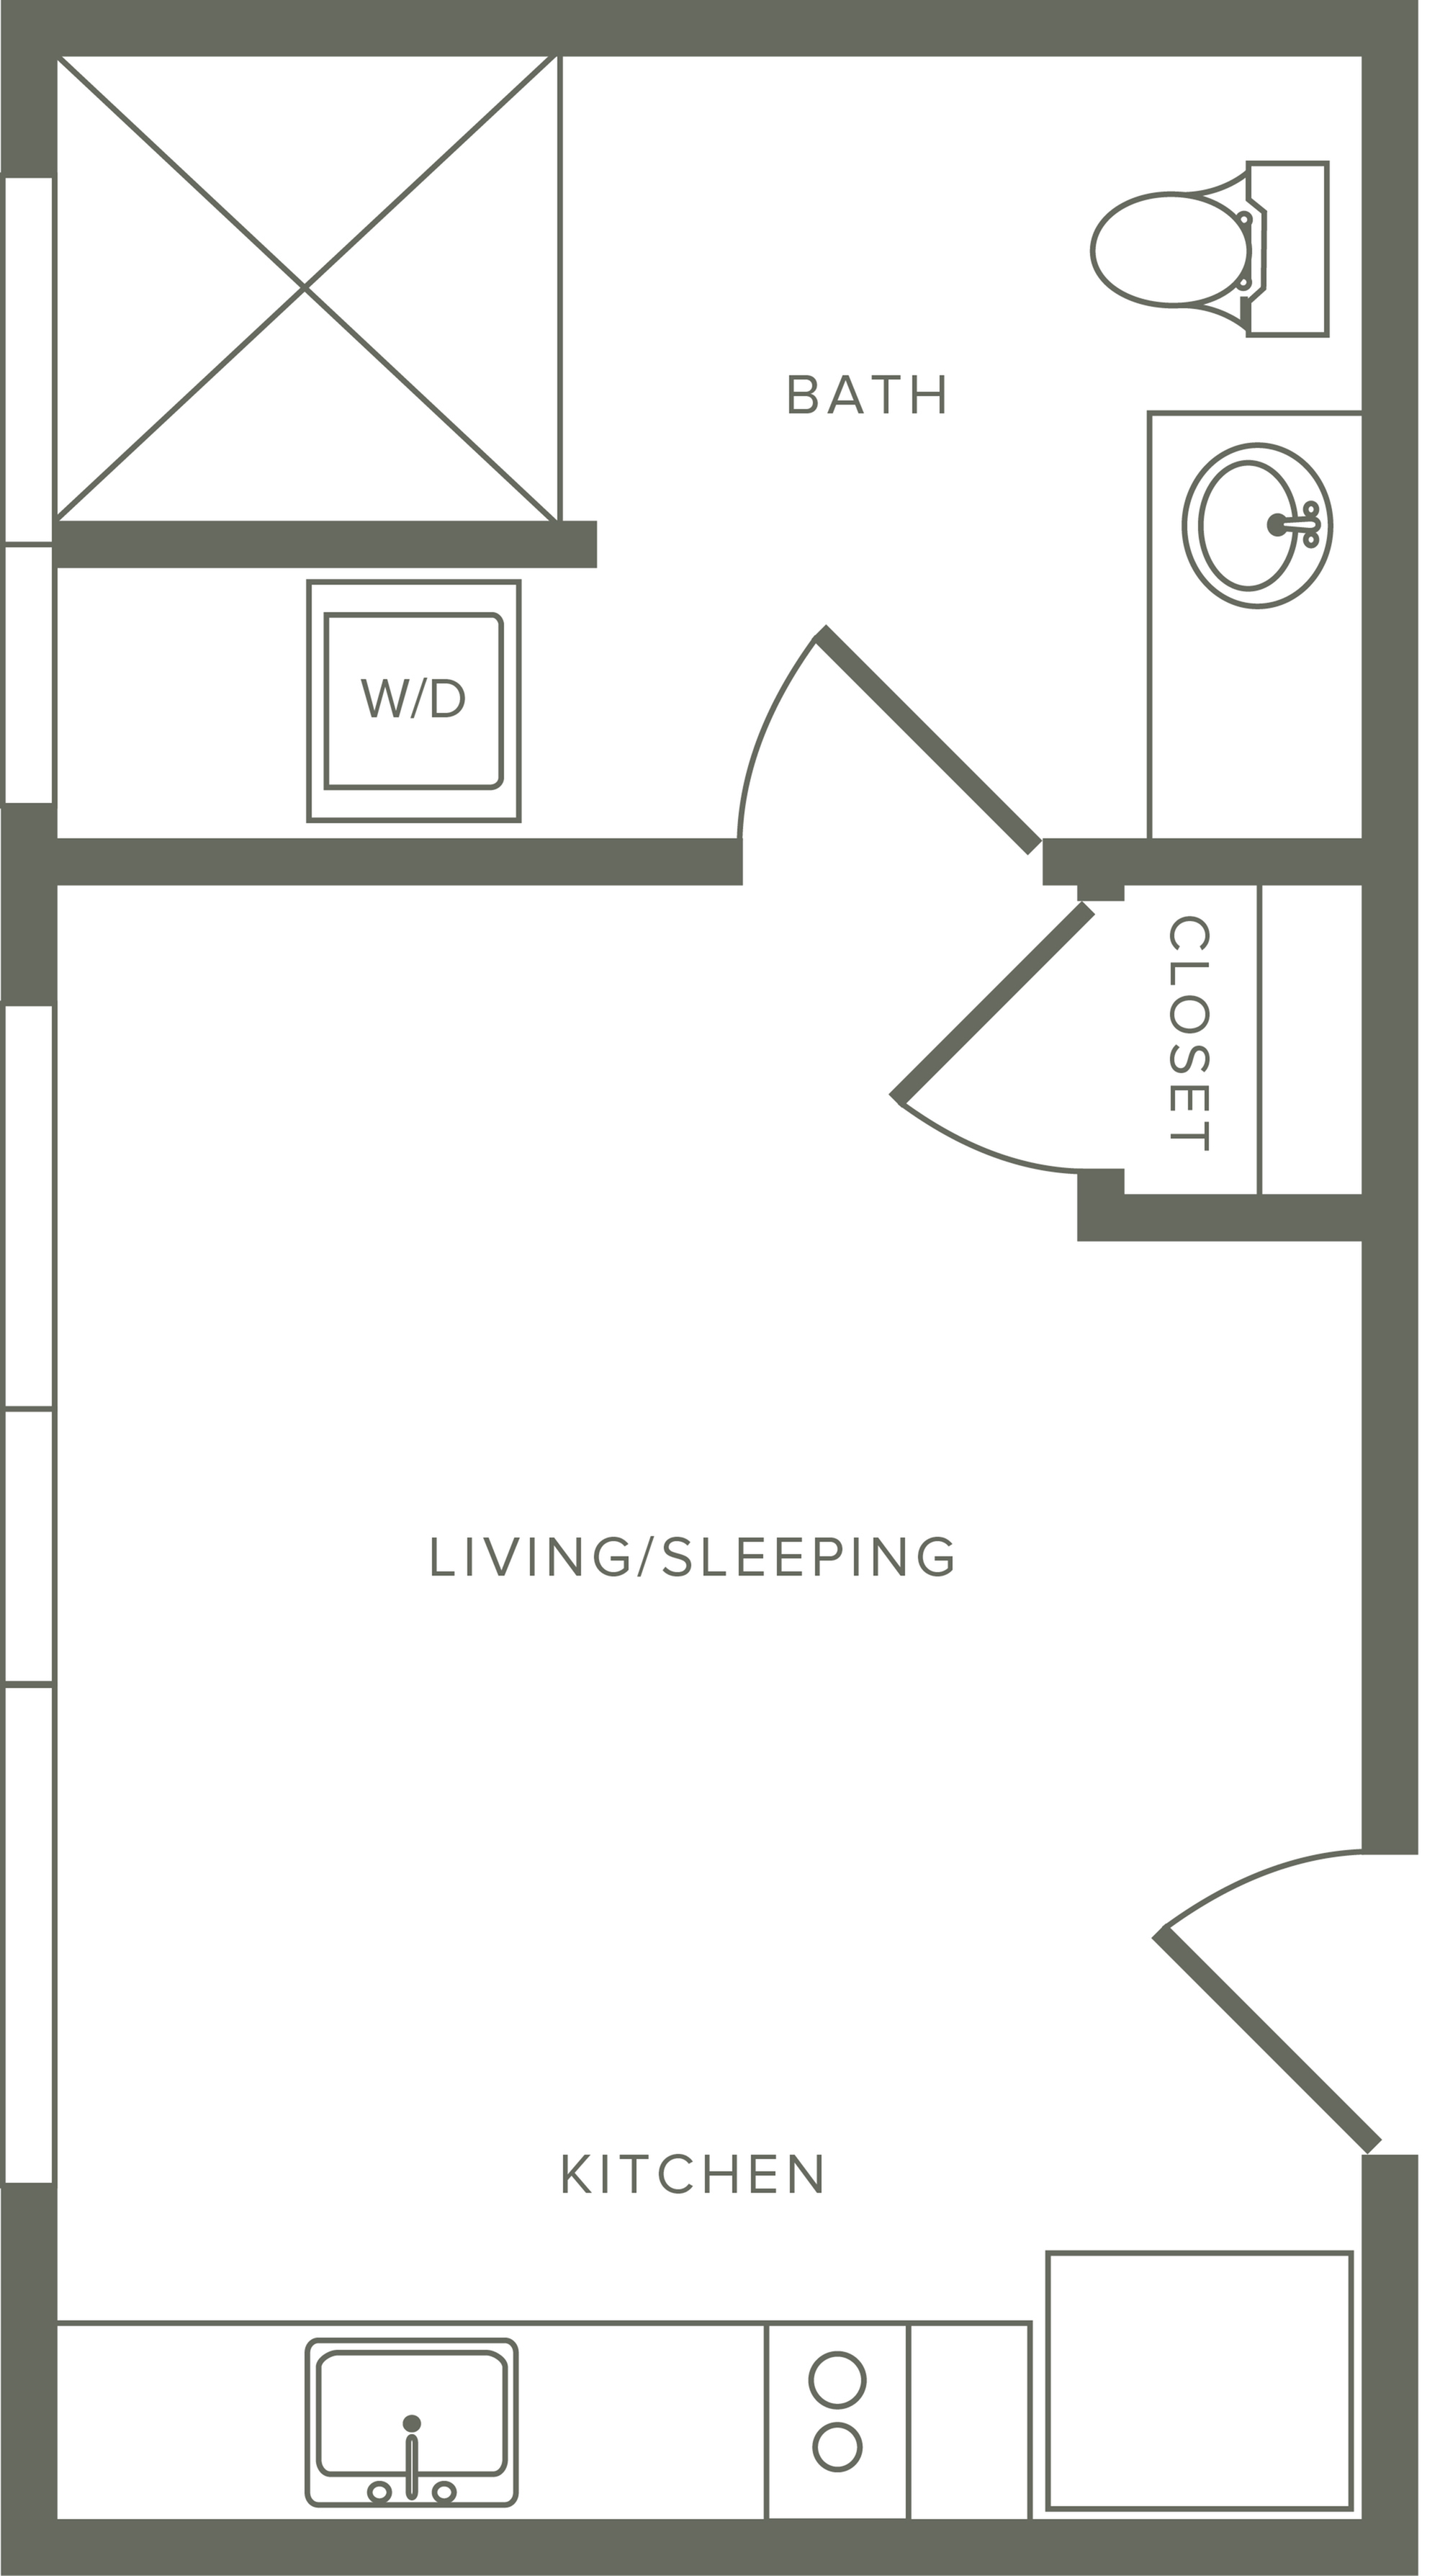 336 square foot studio one bath floor plan image